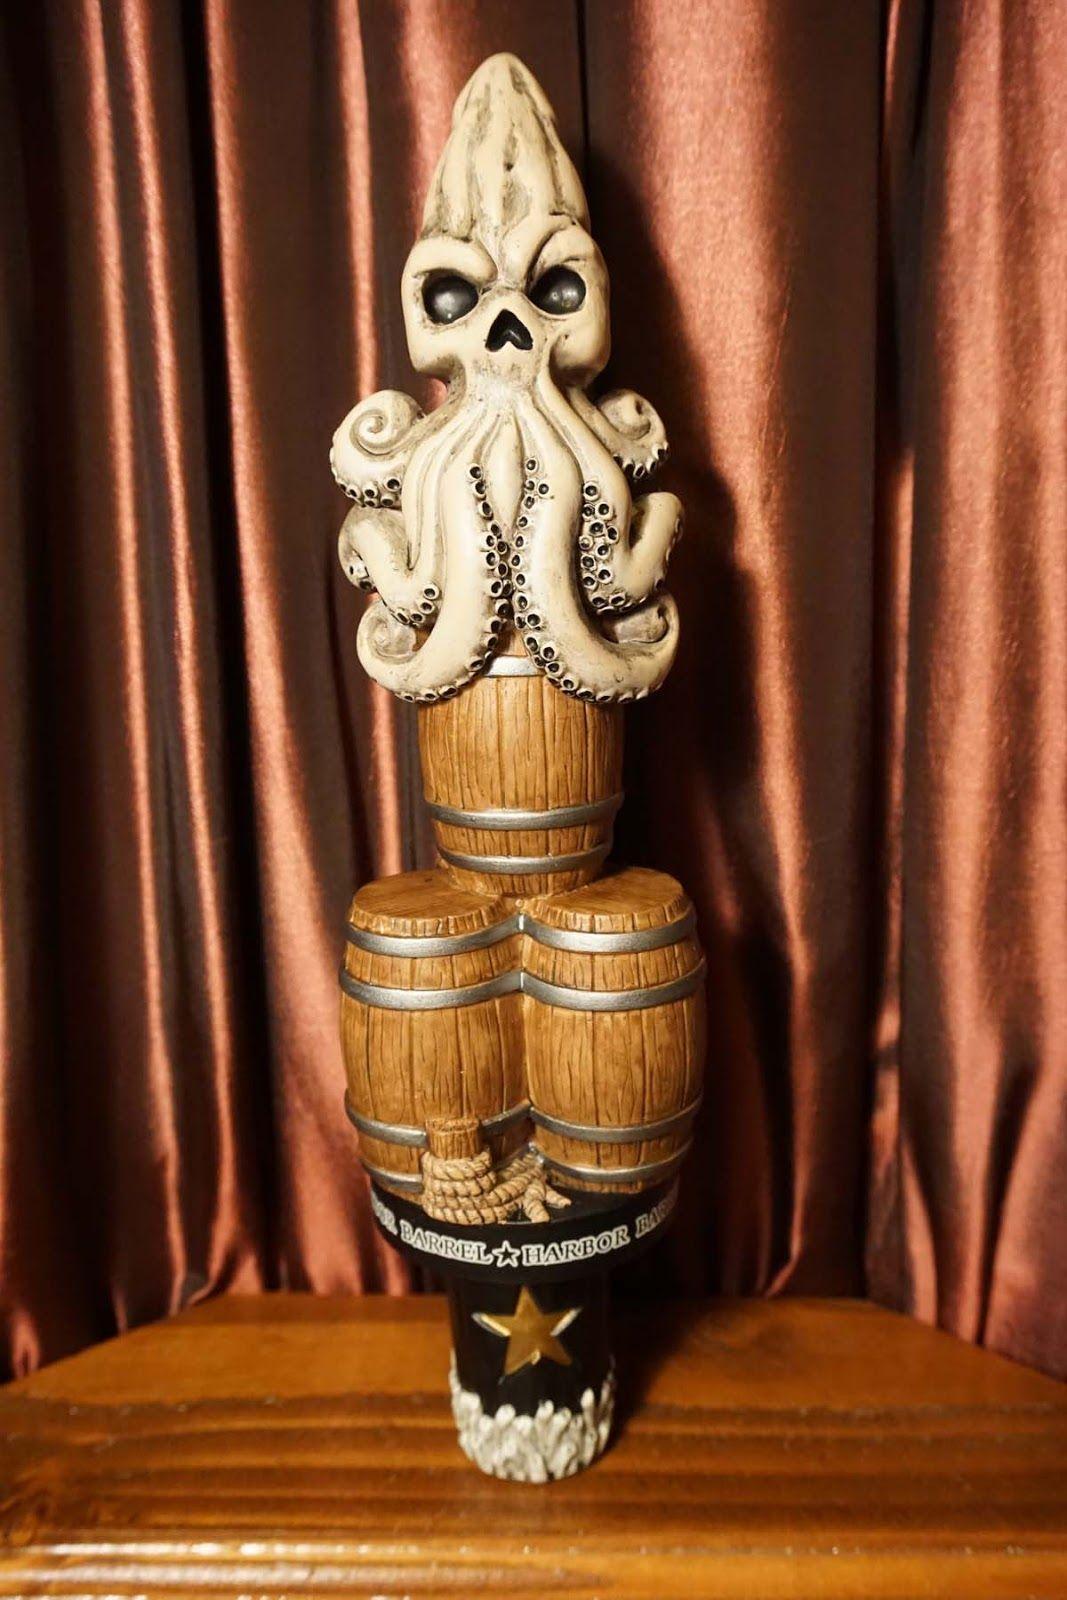 Amazing beer tap handles craftbeer beer craft beer pinterest amazing beer tap handles craftbeer beer sciox Gallery